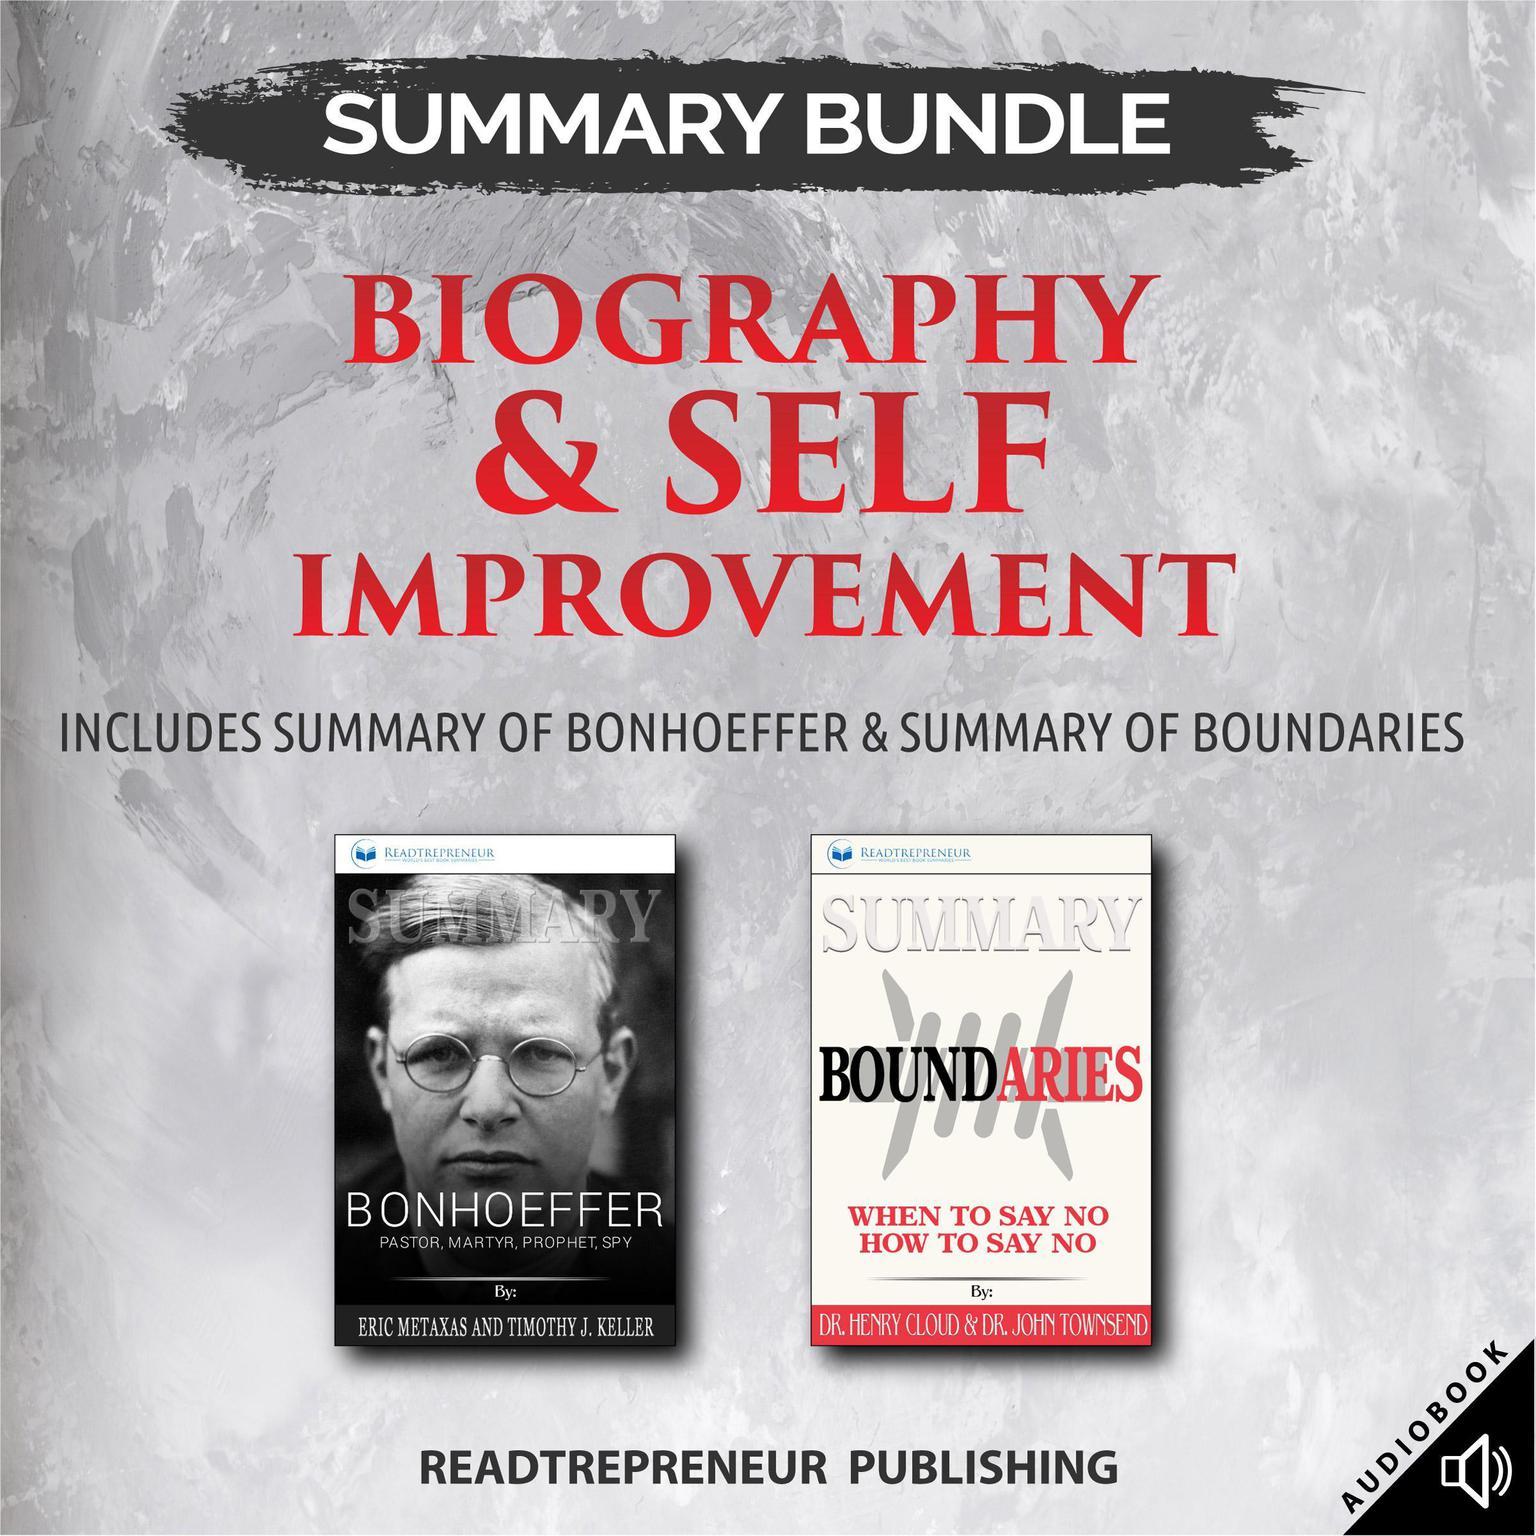 Printable Summary Bundle: Biography & Self Improvement | Readtrepreneur Publishing: Includes Summary of Bonhoeffer & Summary of Boundaries Audiobook Cover Art